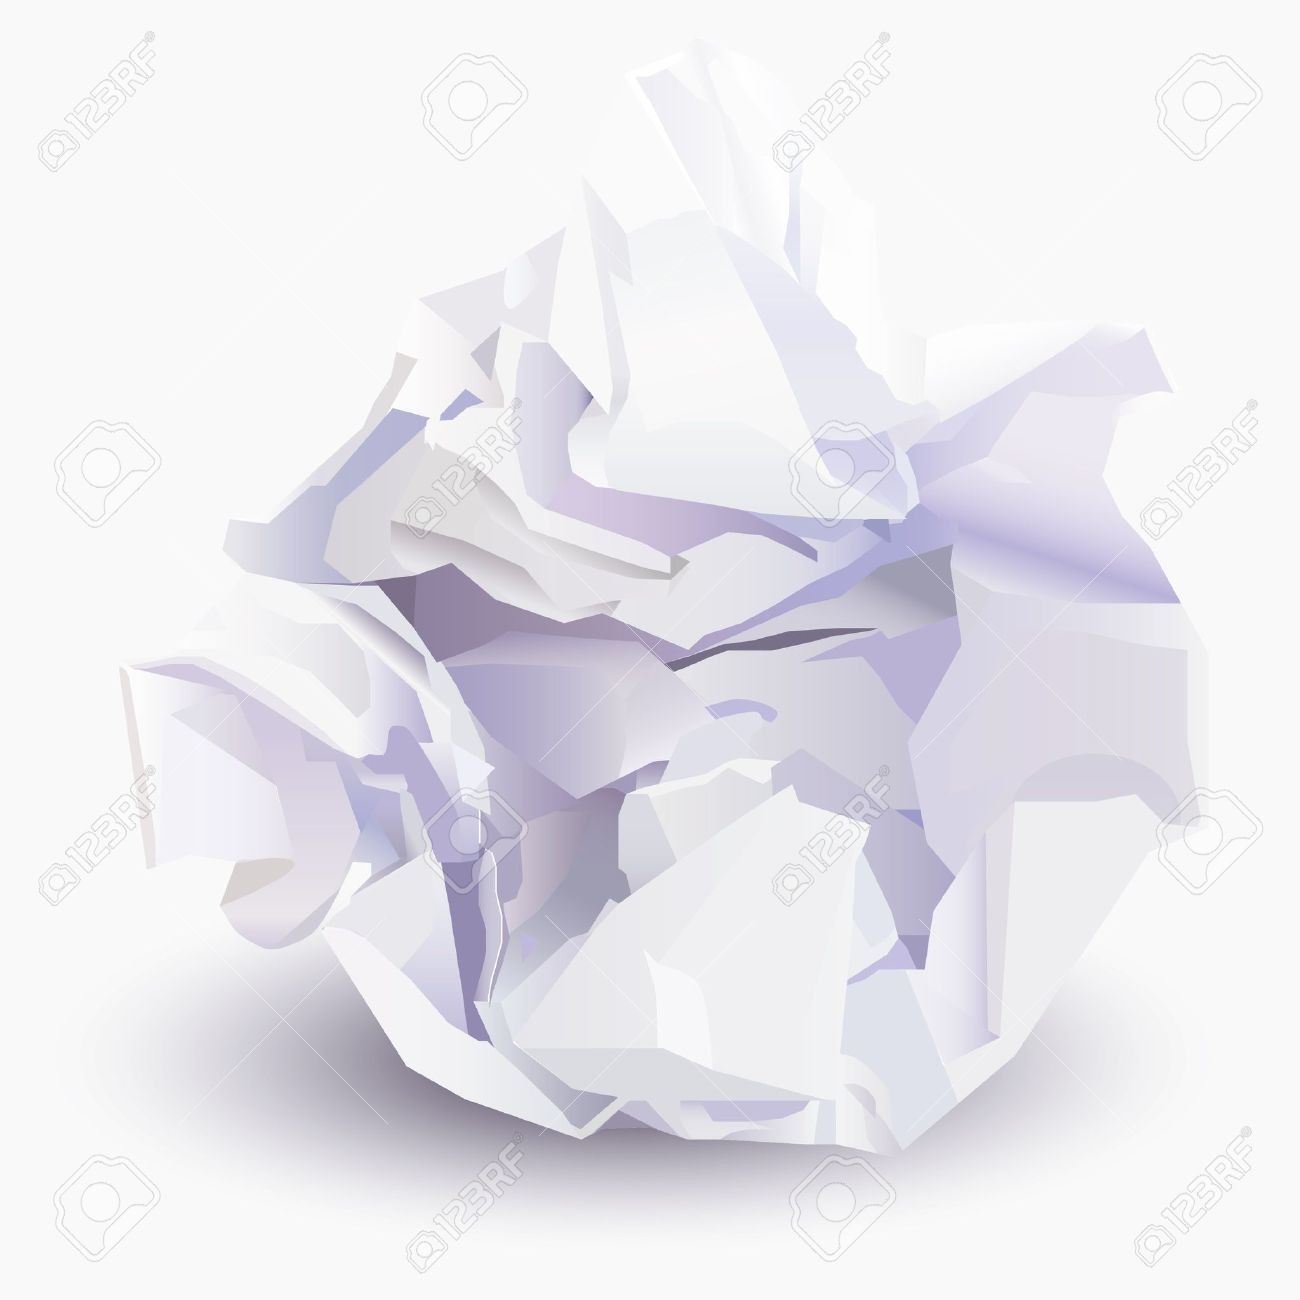 Crumpled paper clipart.